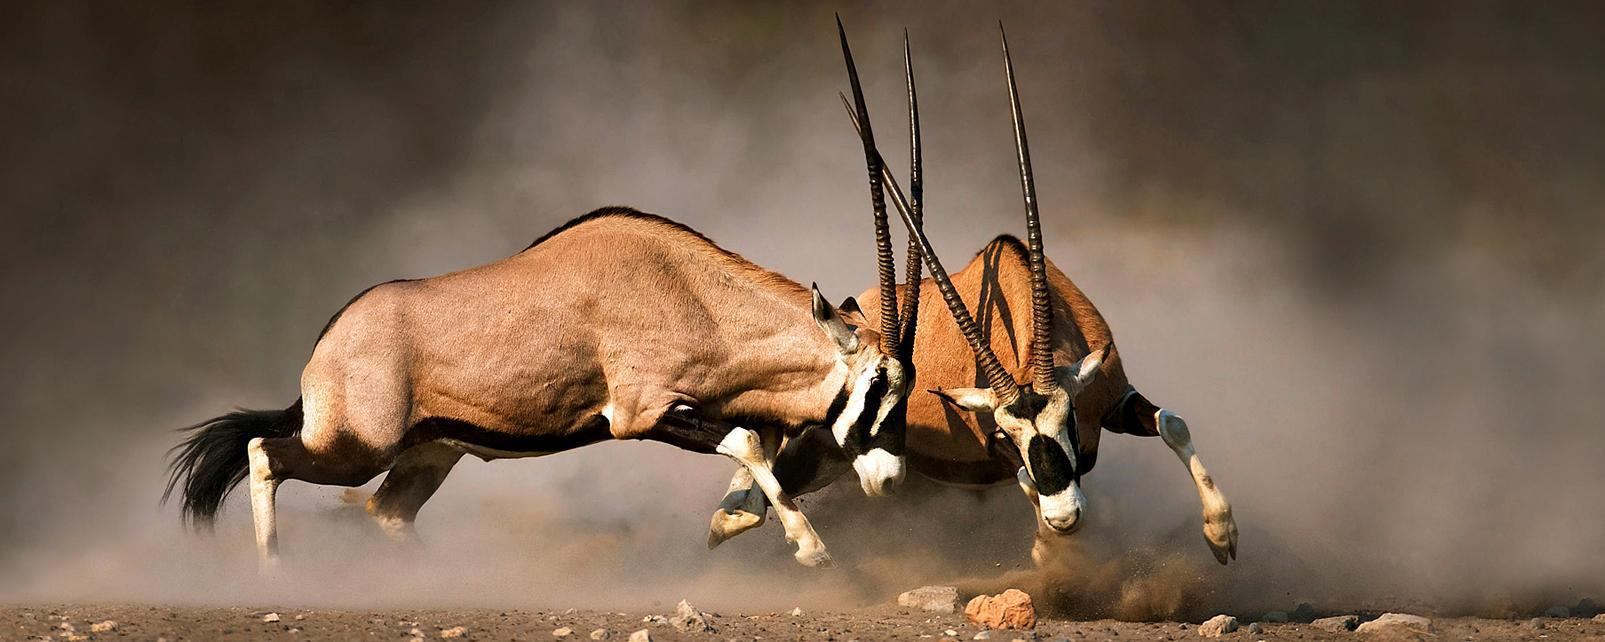 Afrique, Lesotho, gemsbok, oryx gazelle, lutte,